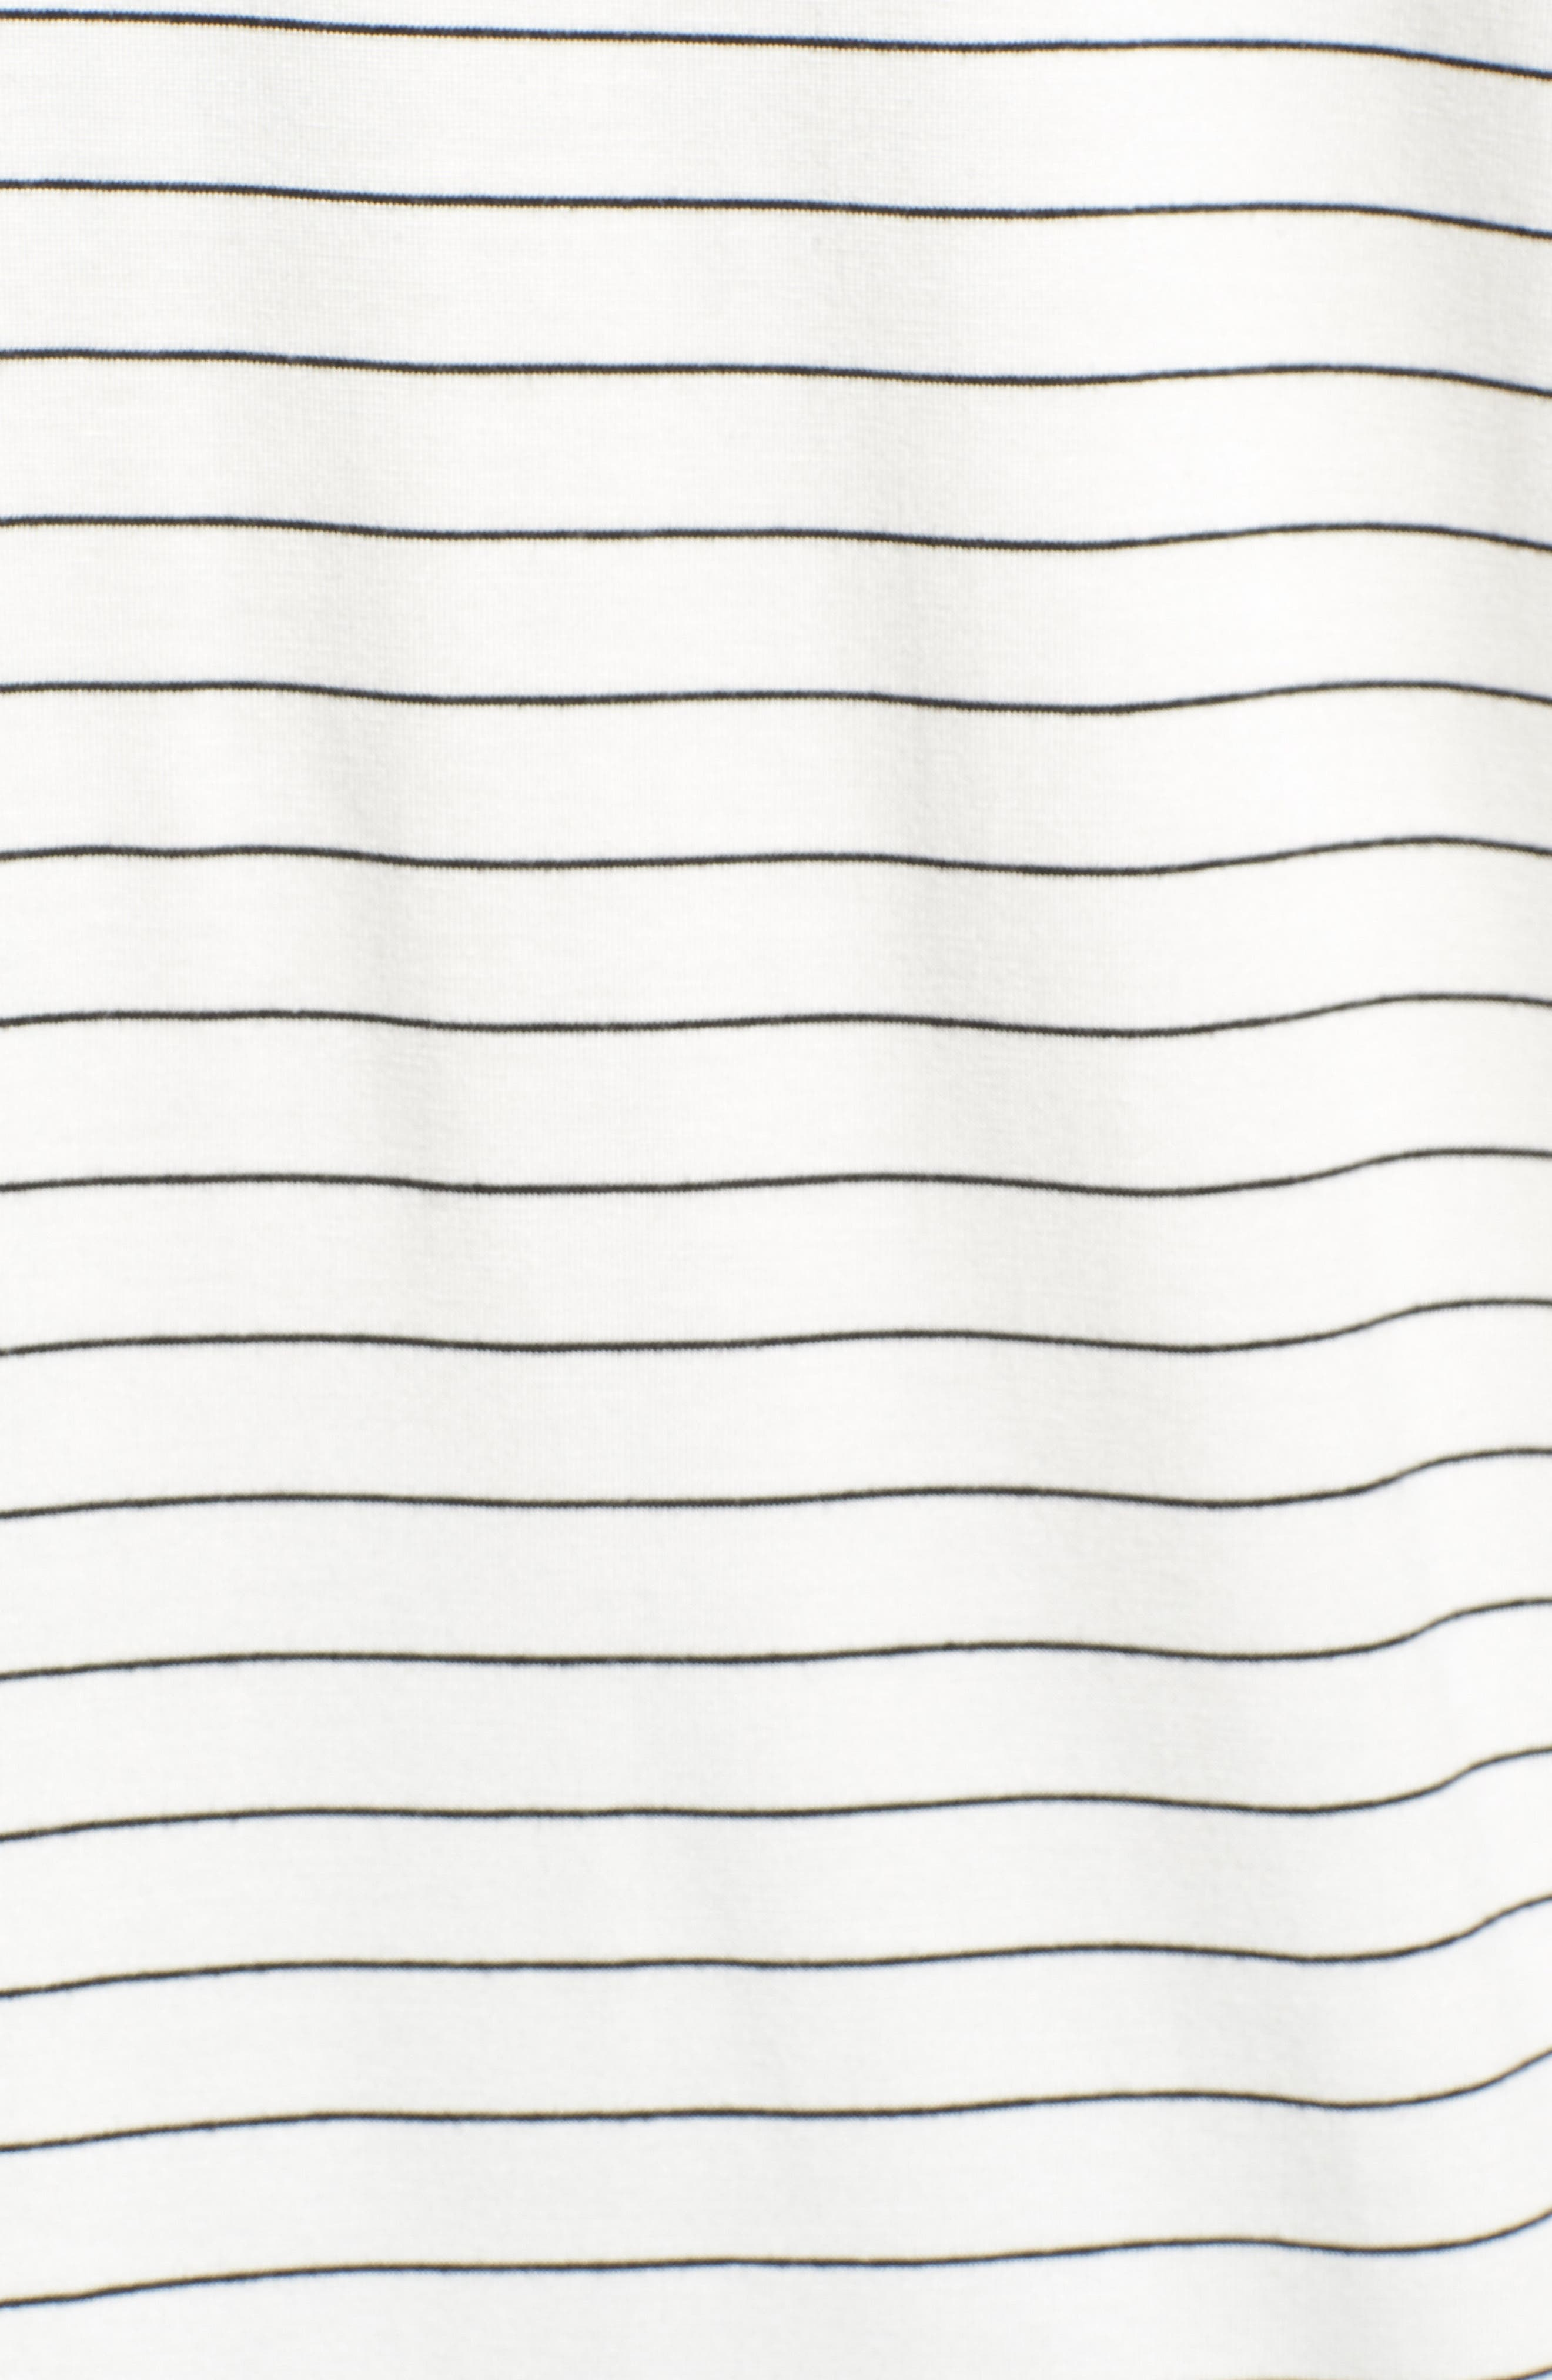 Off-Duty Sleeveless Stretch Knit Top,                             Alternate thumbnail 5, color,                             White- Black Cloud Stripe